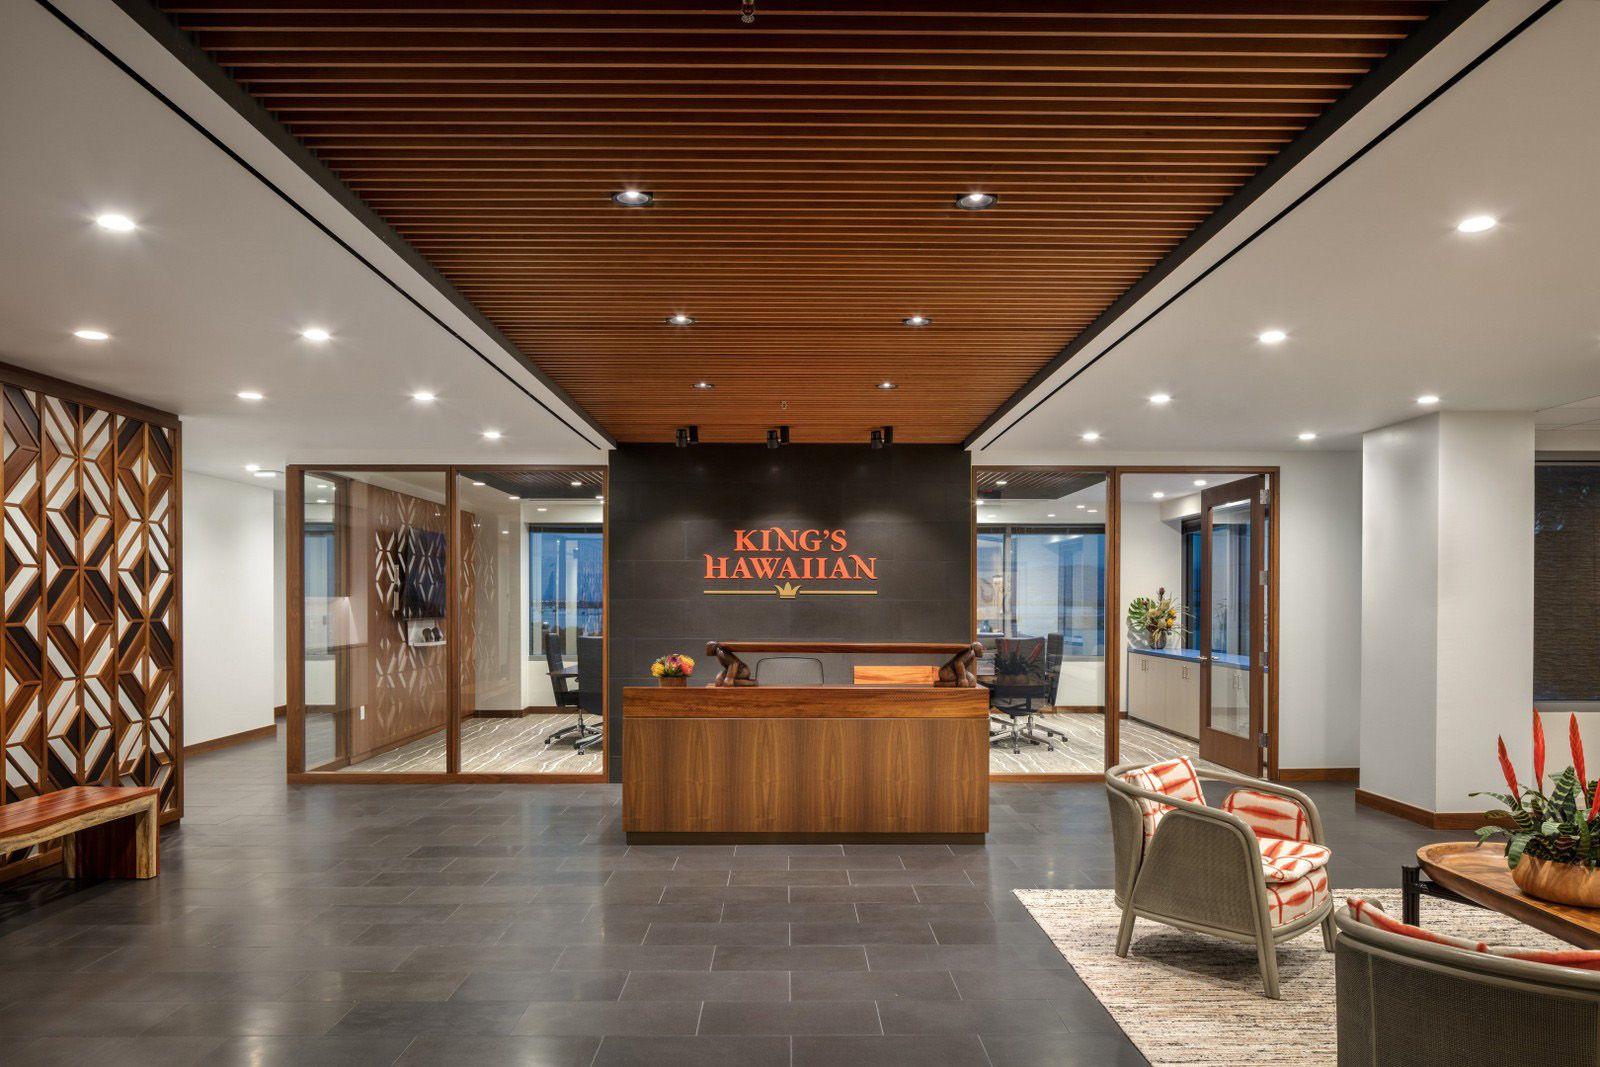 Office Tour Kings Hawaiian Offices Torrance Office reception